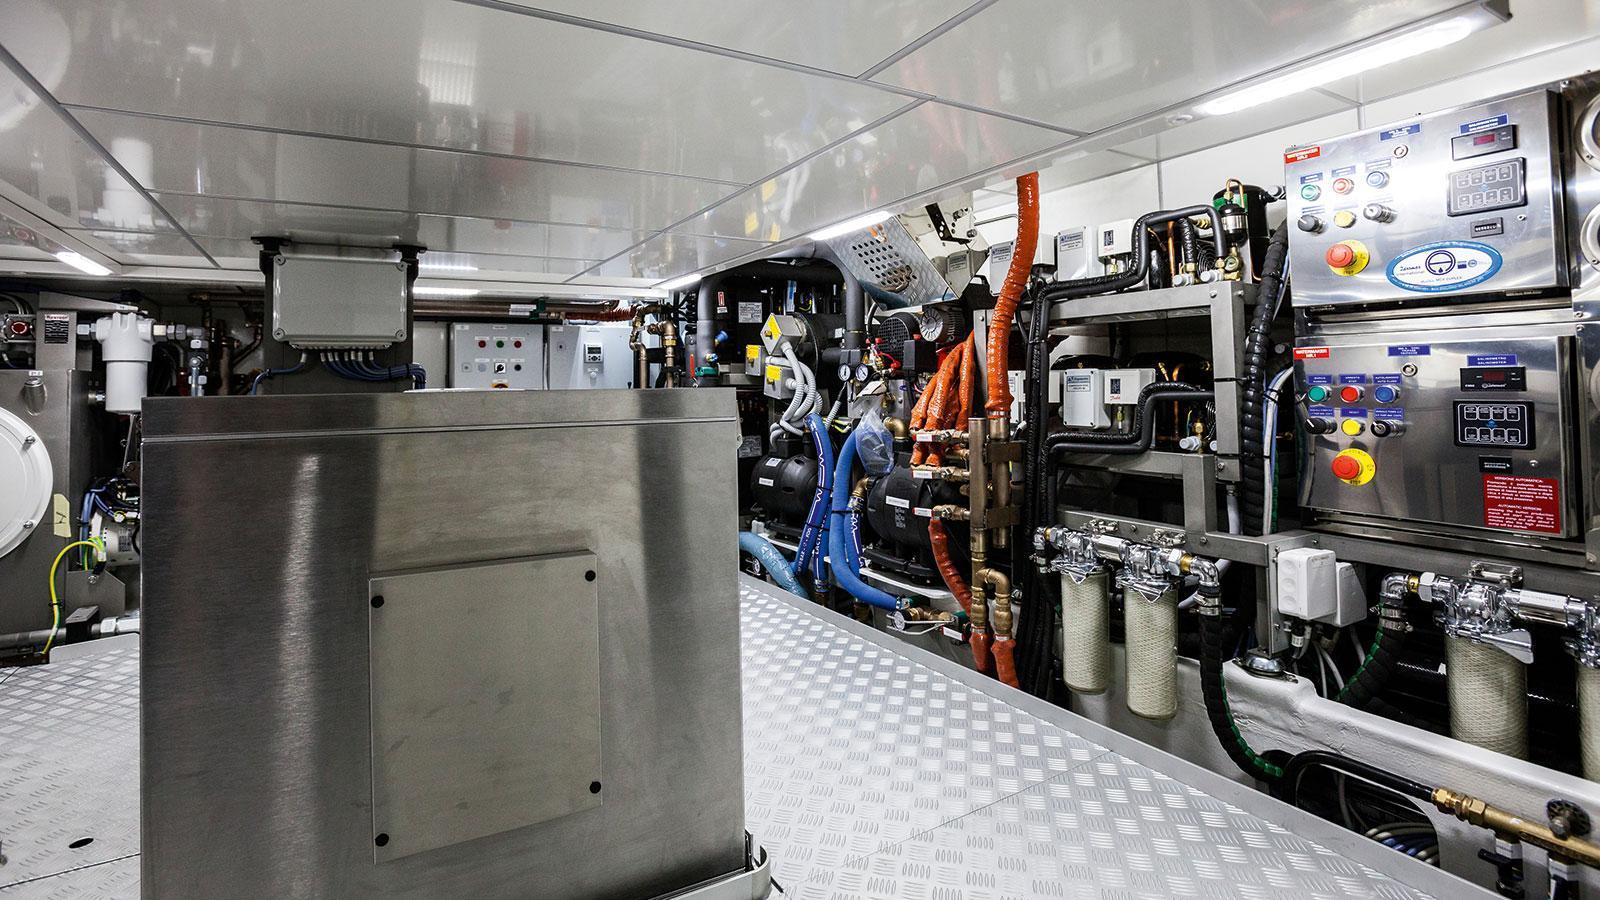 solleone-motor-yacht-nautors-swan-115-s-2015-35m-engine-room